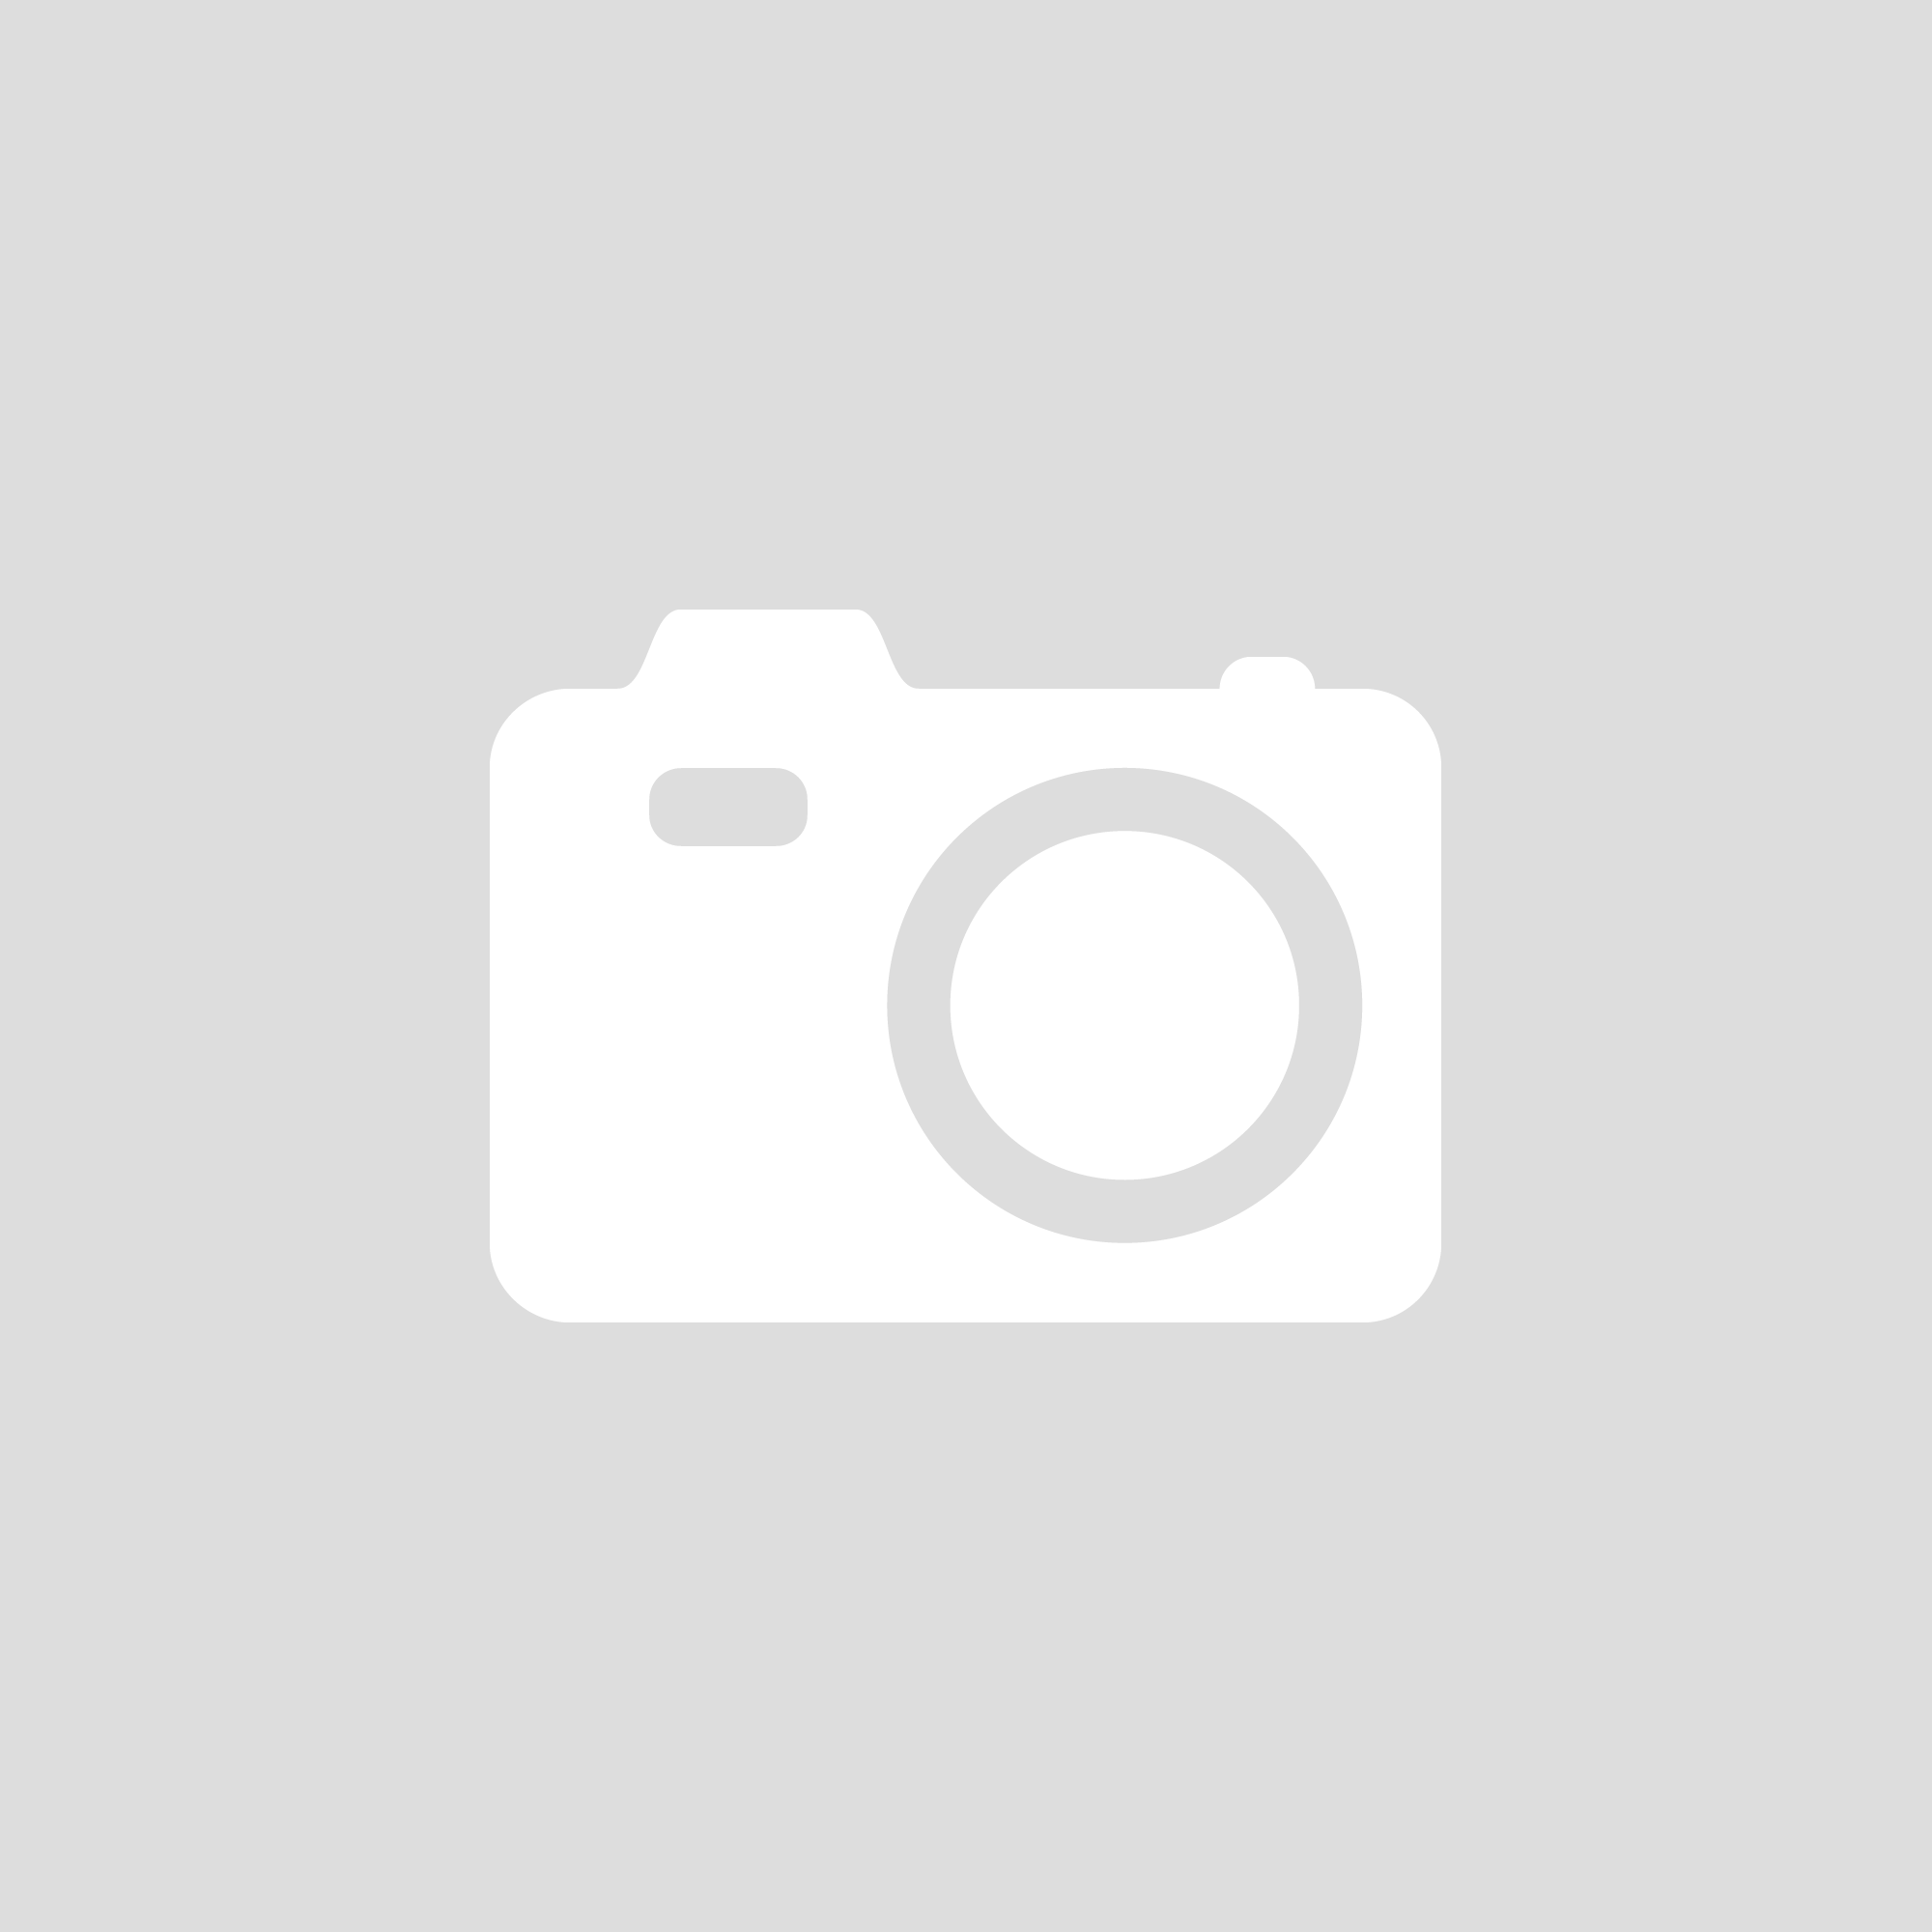 Aurora Rose Taupe / Cream By GranDeco AO-16303